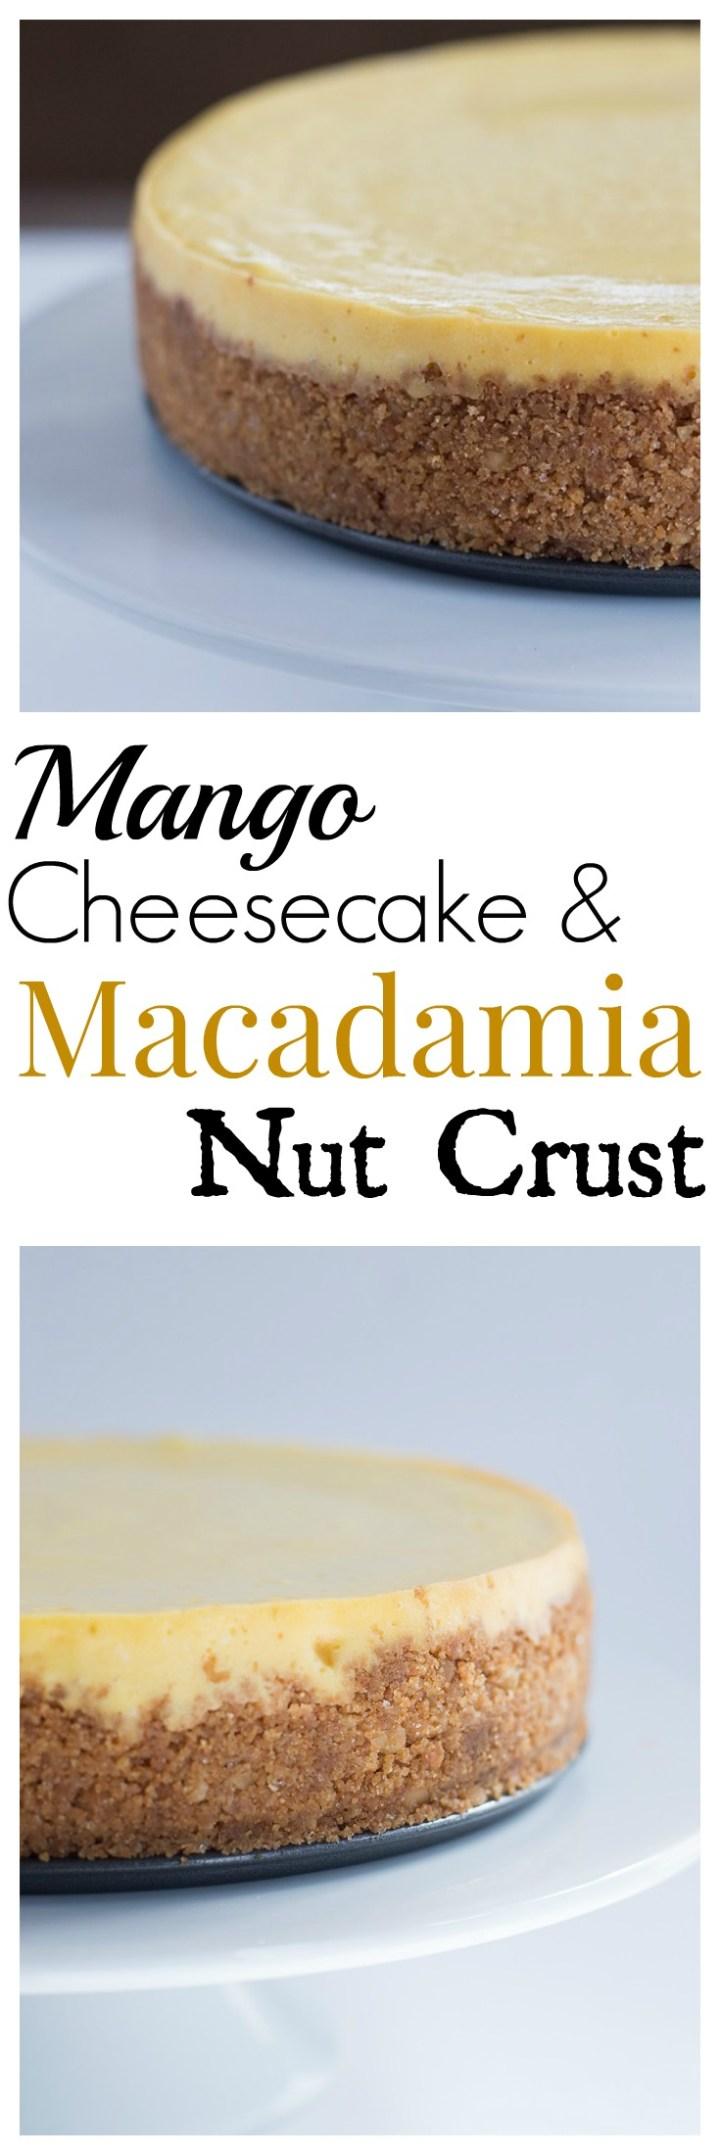 Creamy Mango Cheesecake with a Crunchy Macadamia Nut Crust